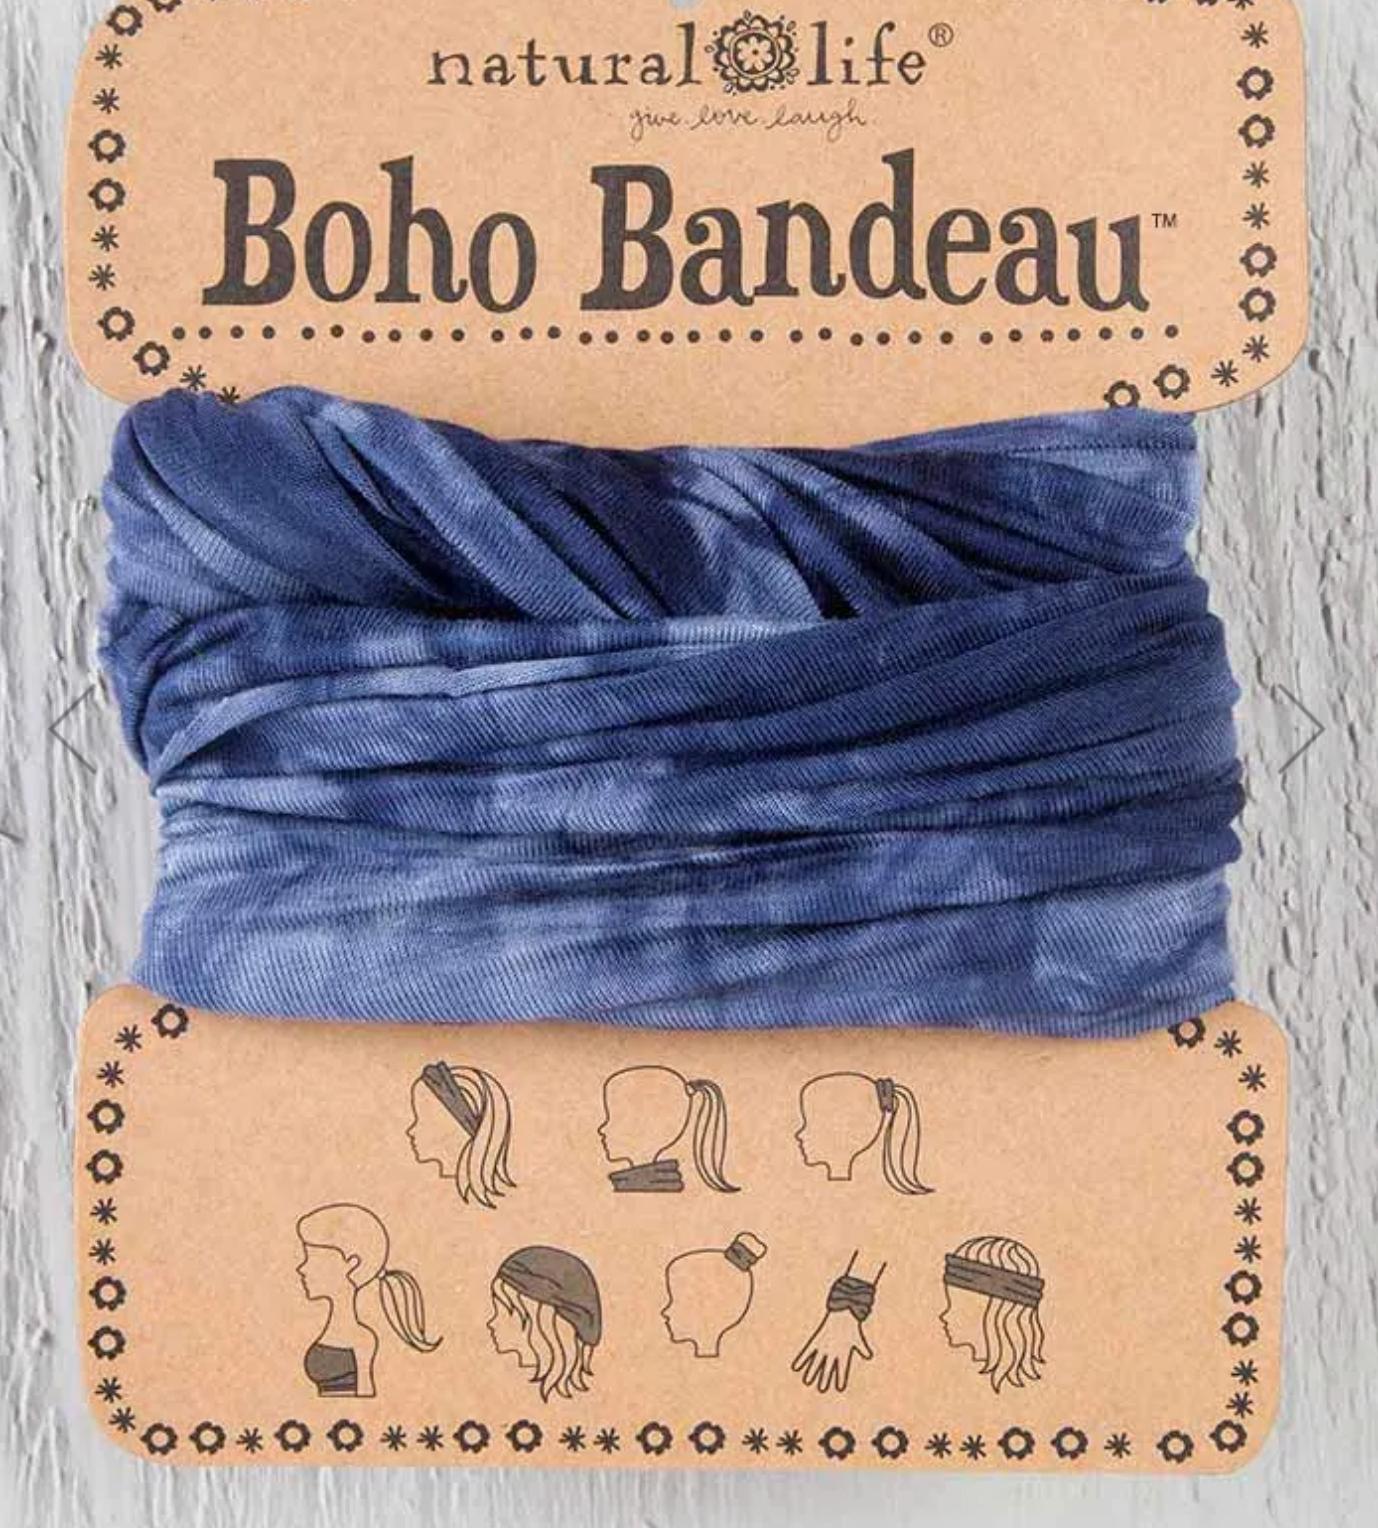 Natural Life Boho Bandeau - Navy/White Tie Dye